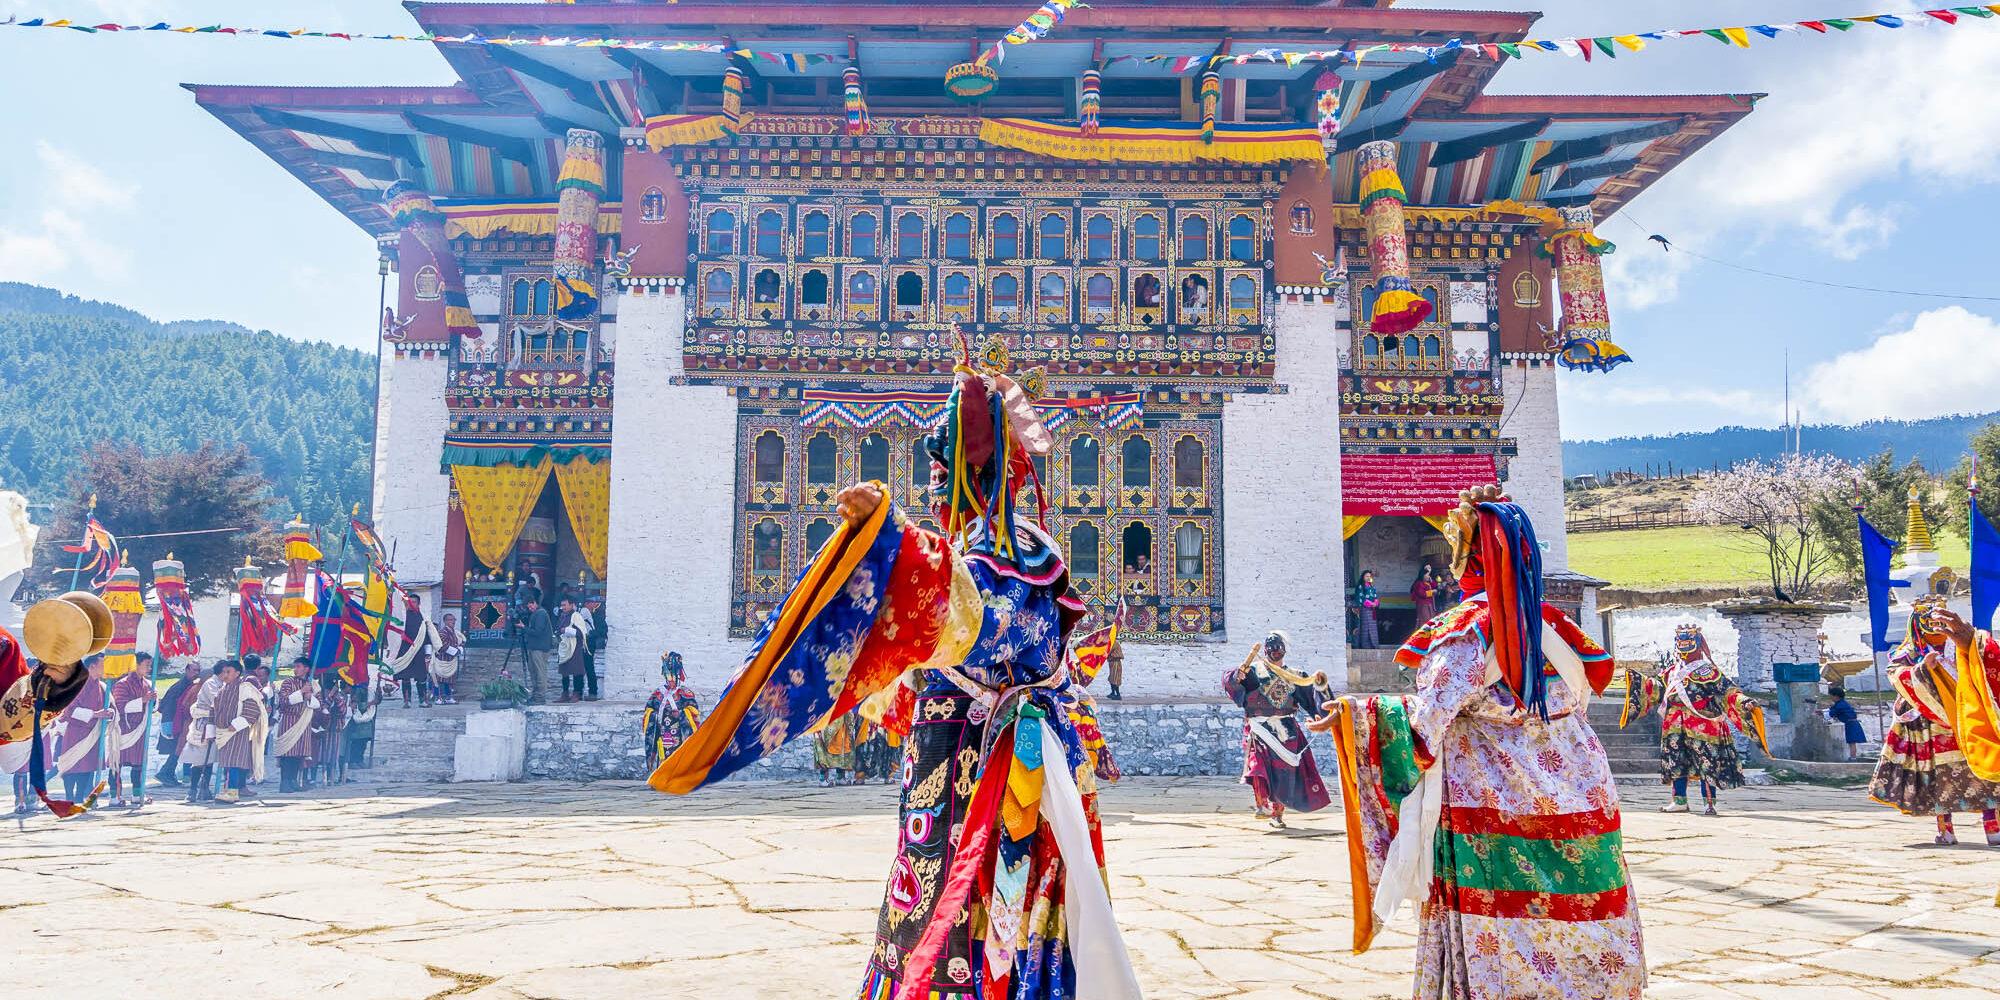 Colorful Bhutan festival with dragon masks